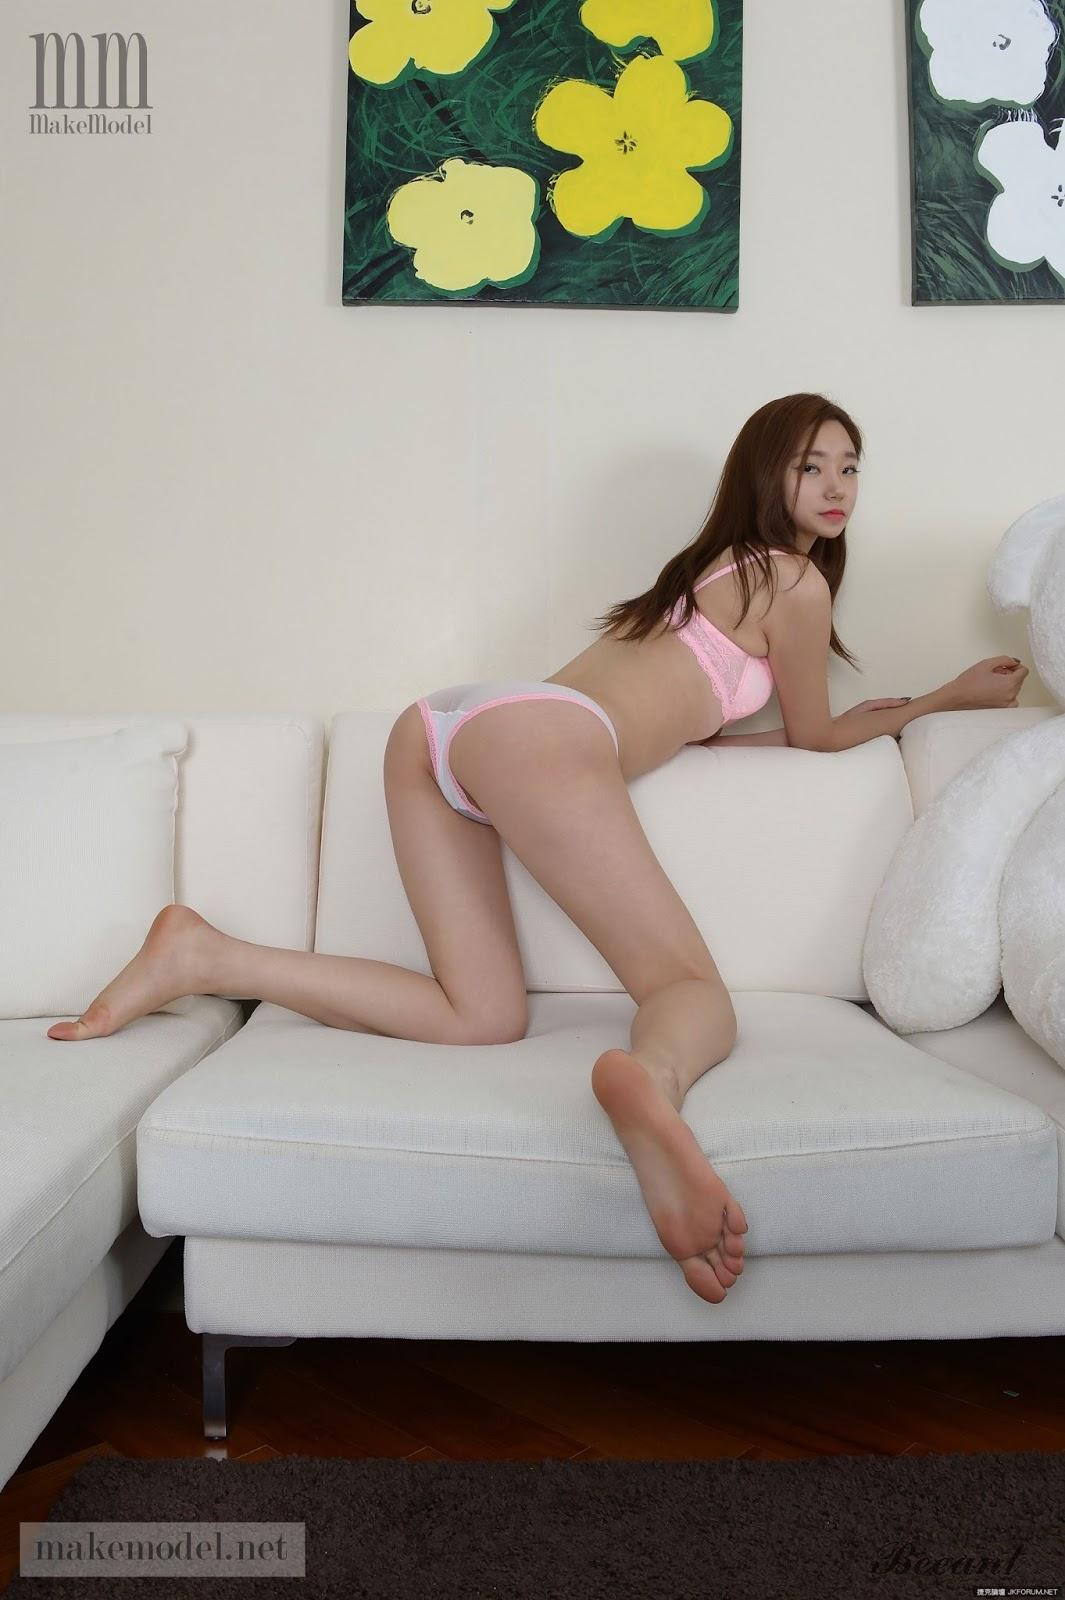 270912 3442 - Korean Nude - Big Albom Remain #A-korean girl